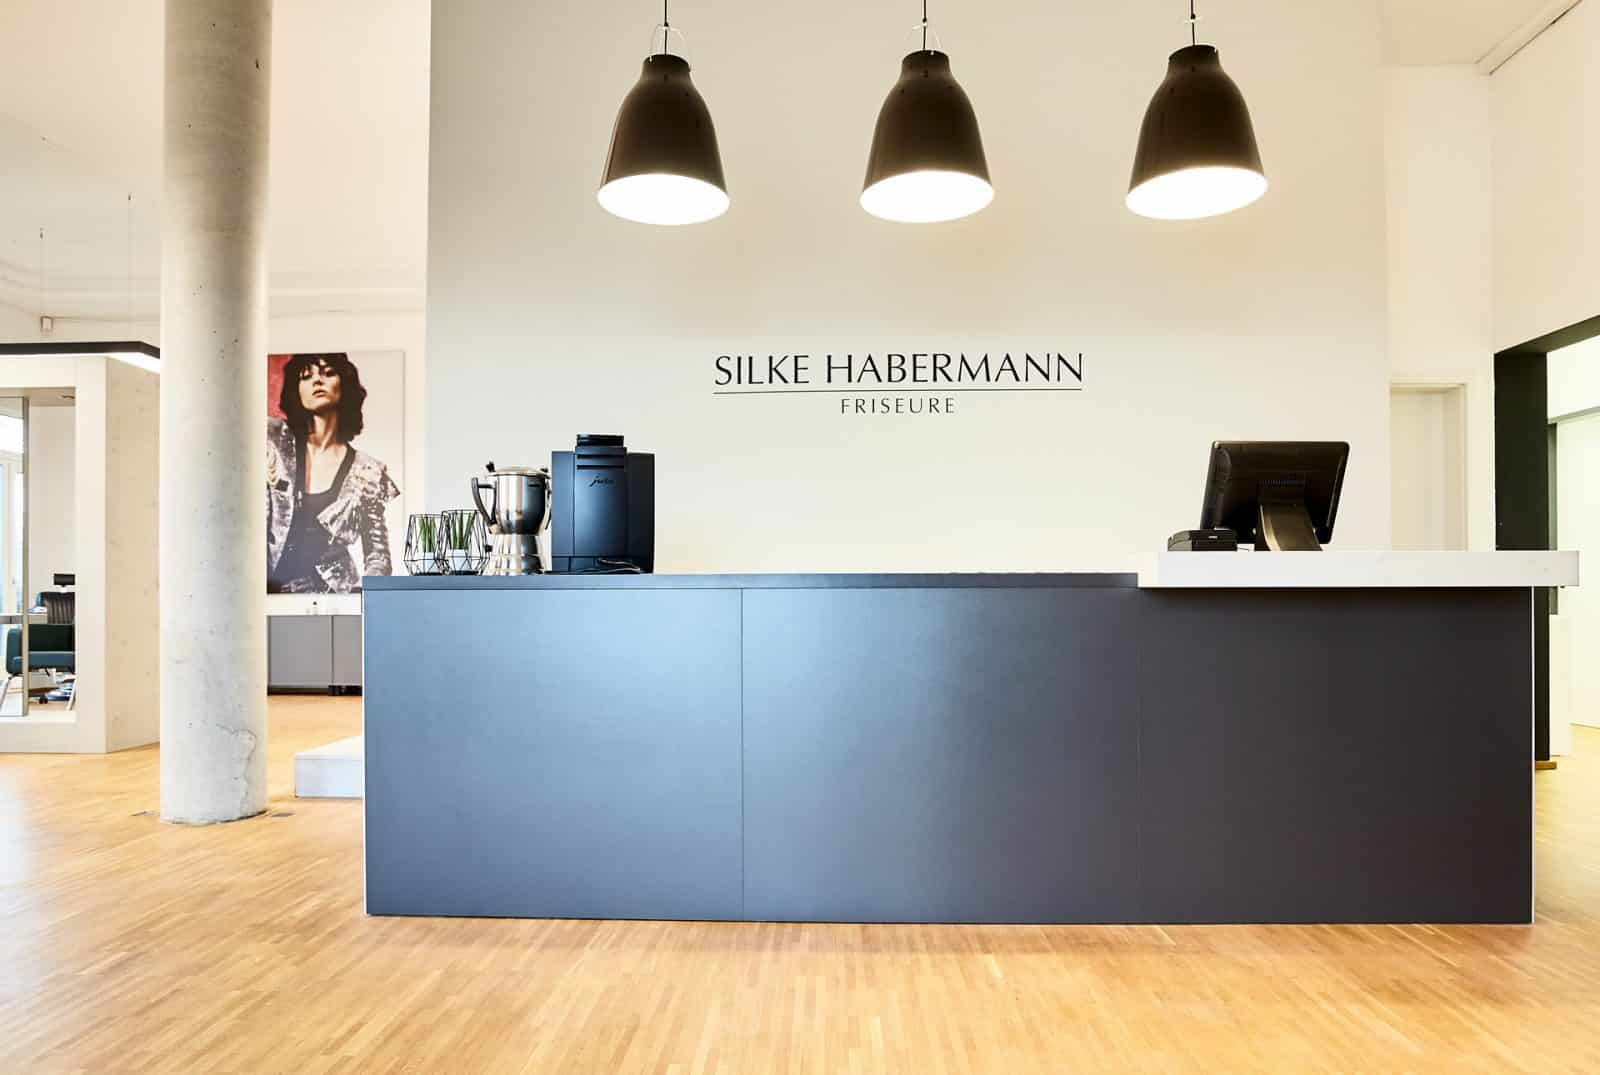 friseur-silke-habermann-05681a